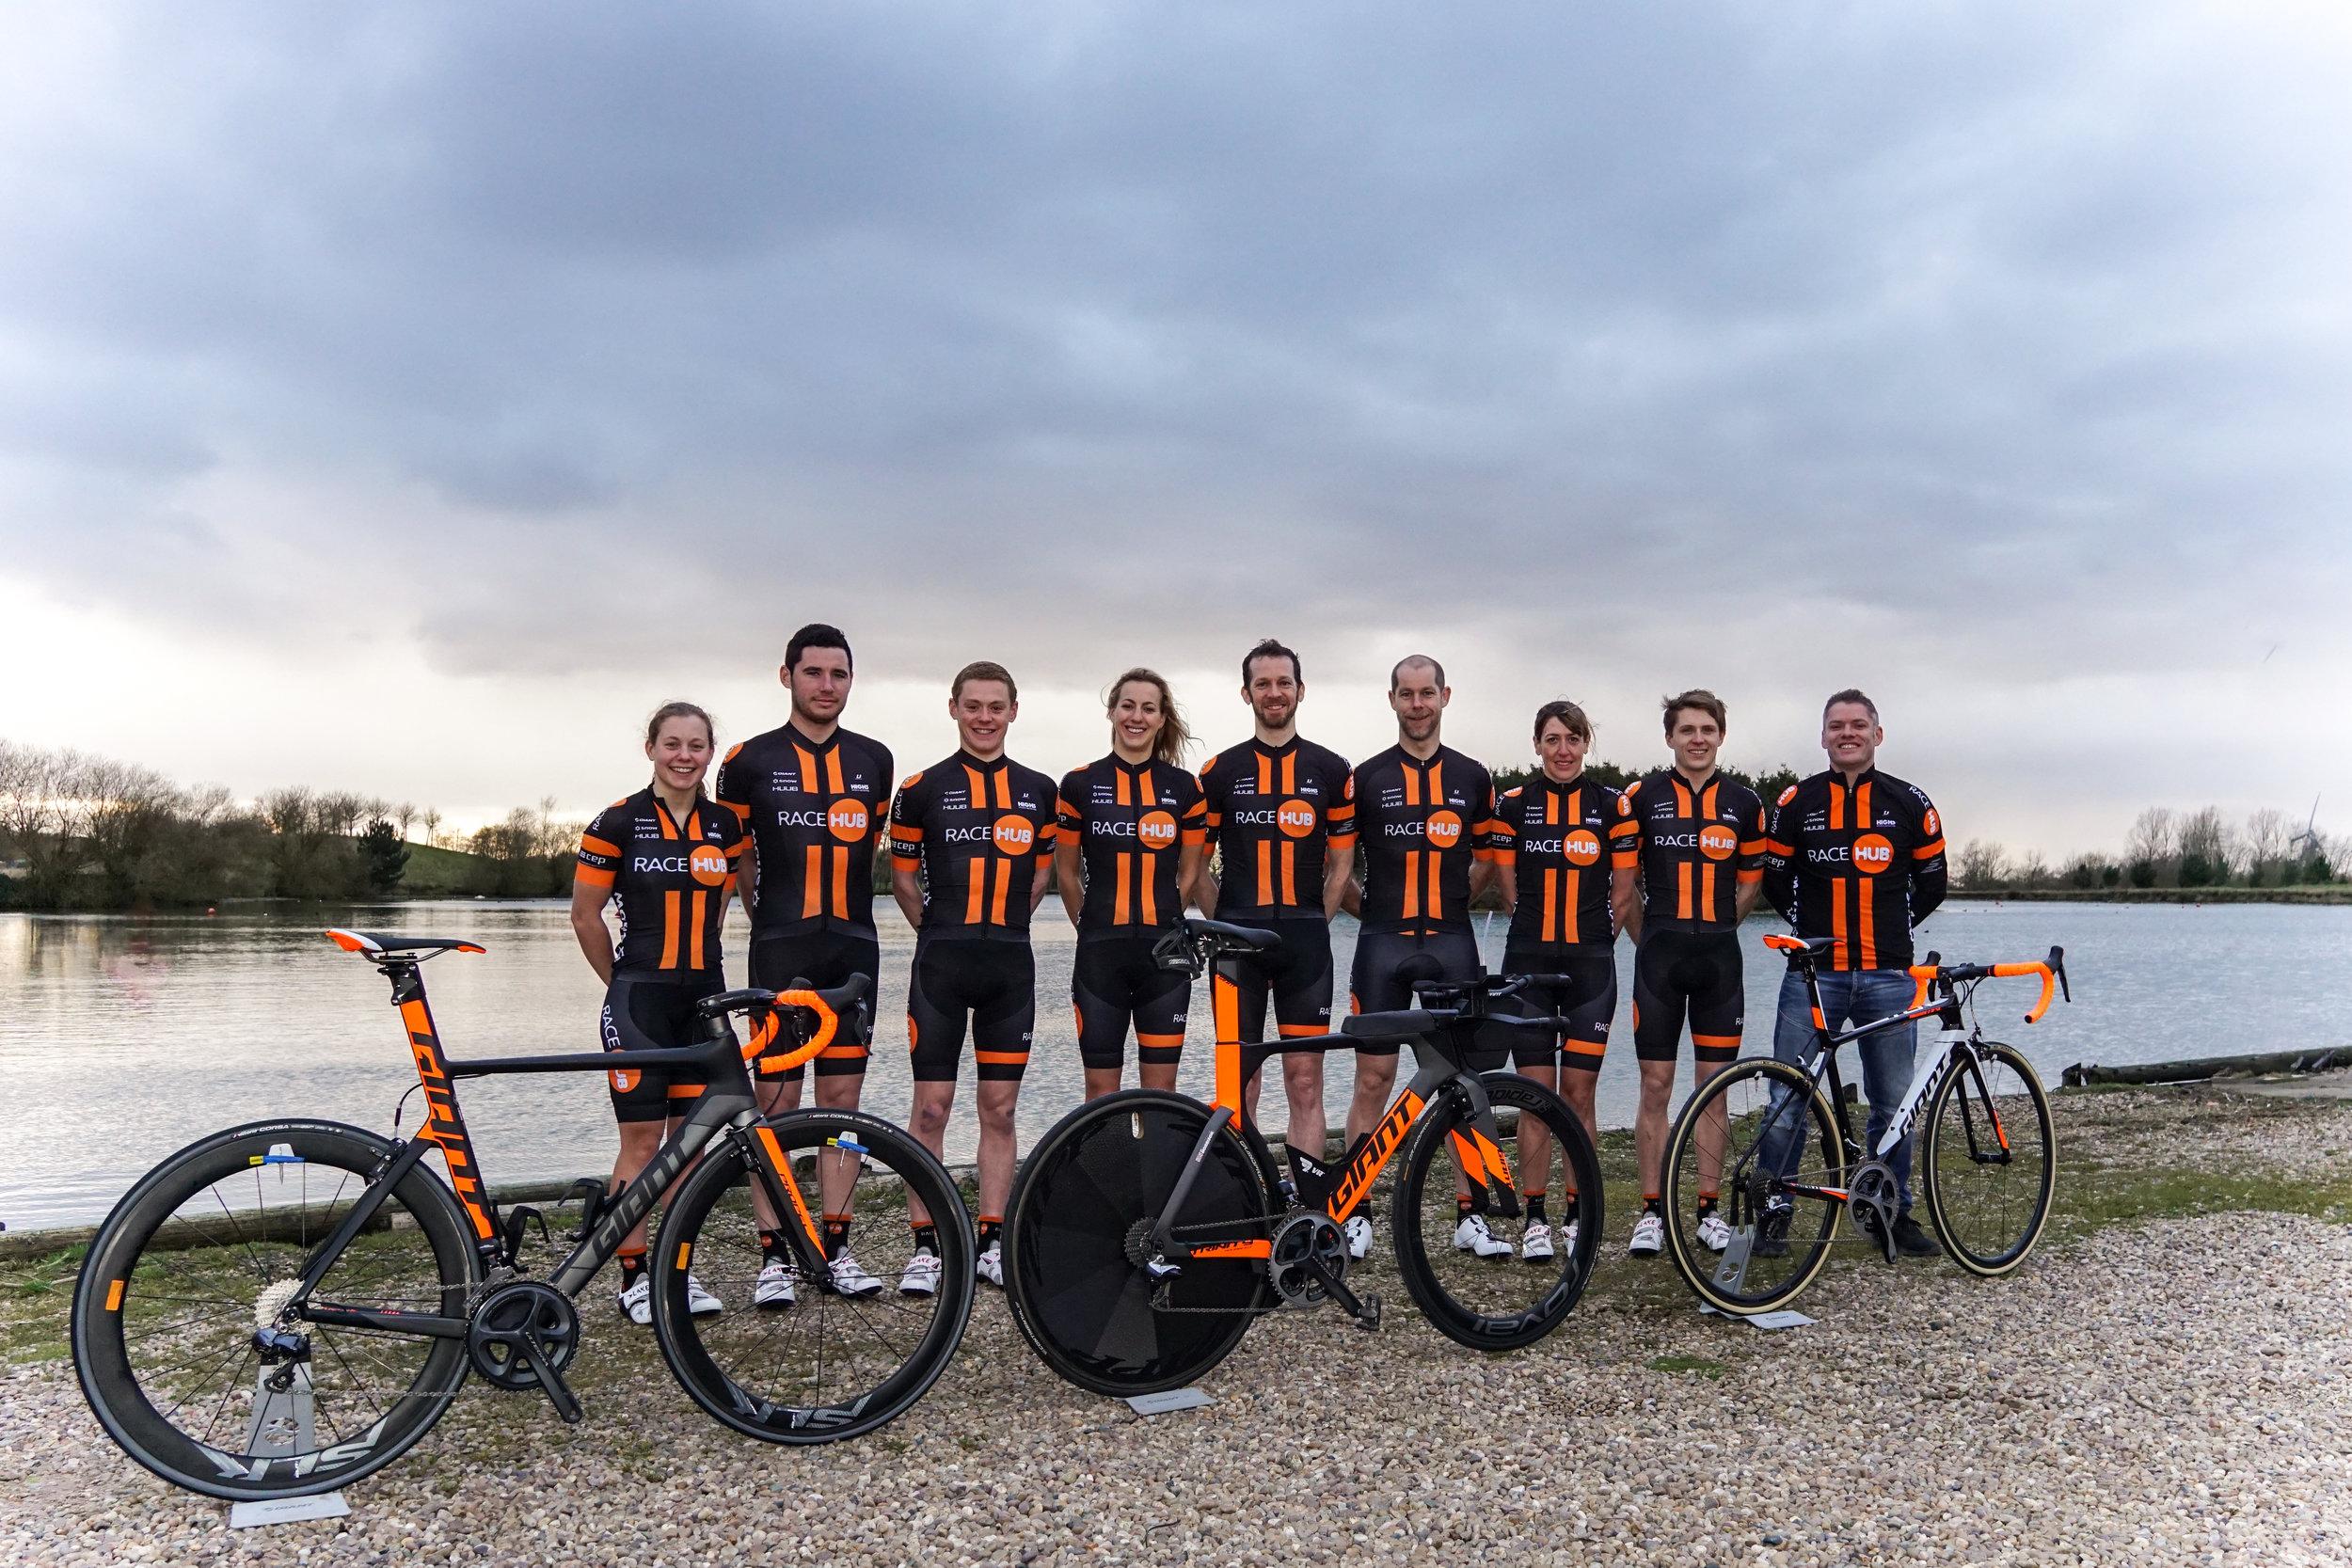 Race team 1.jpg